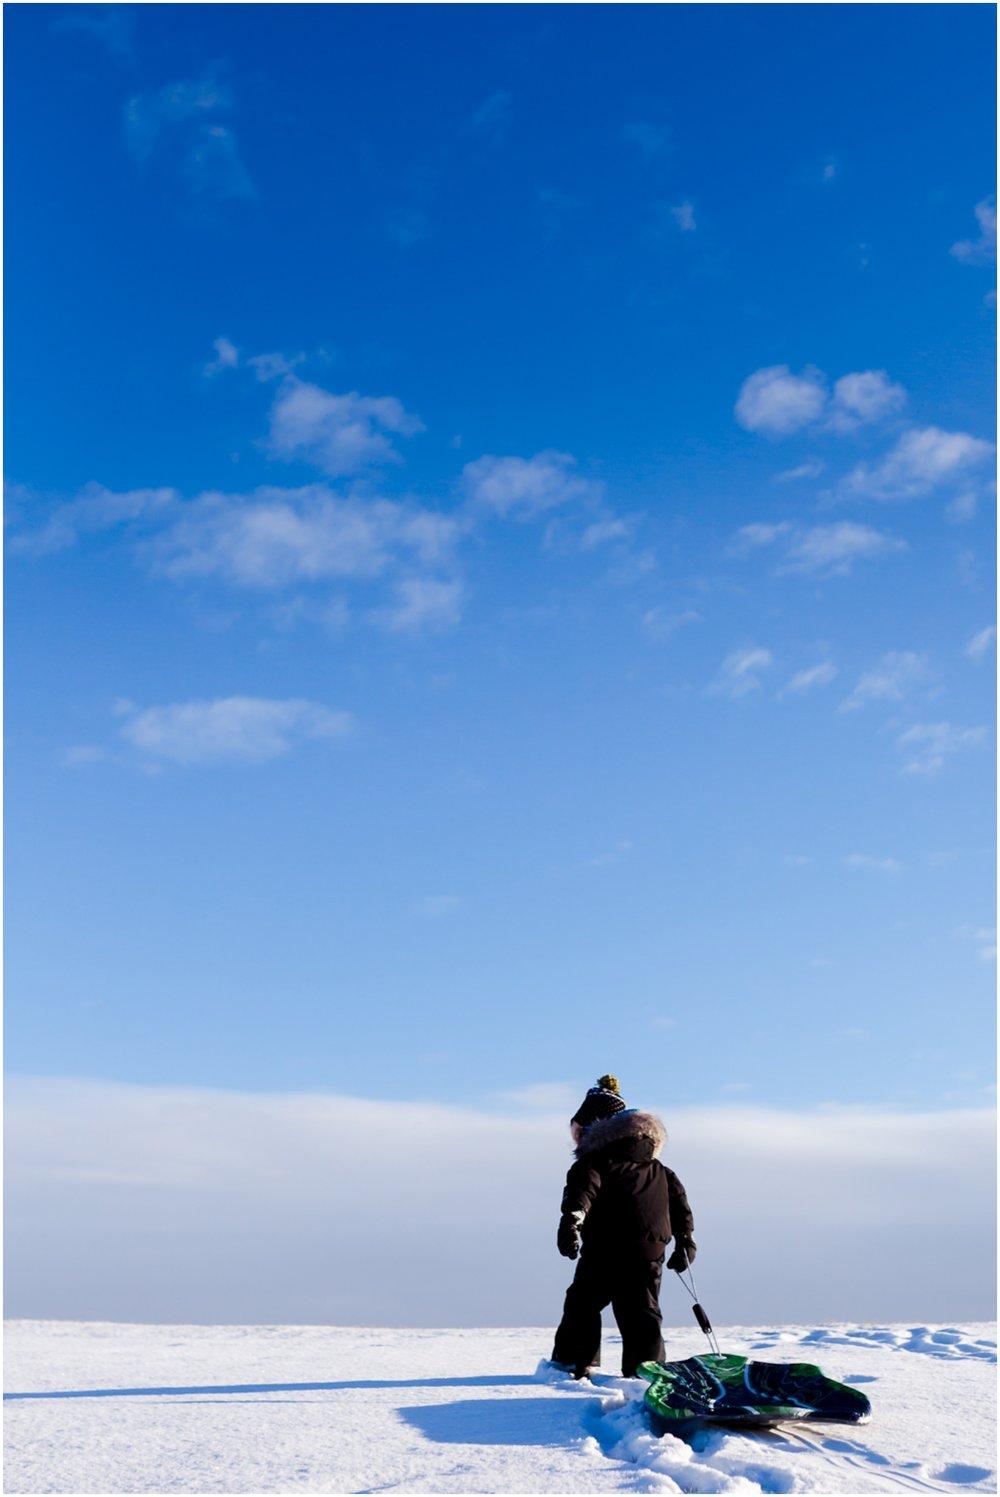 Edmonton Lifestyle Photographer - Best of 2016 - YEG - Sledding winter